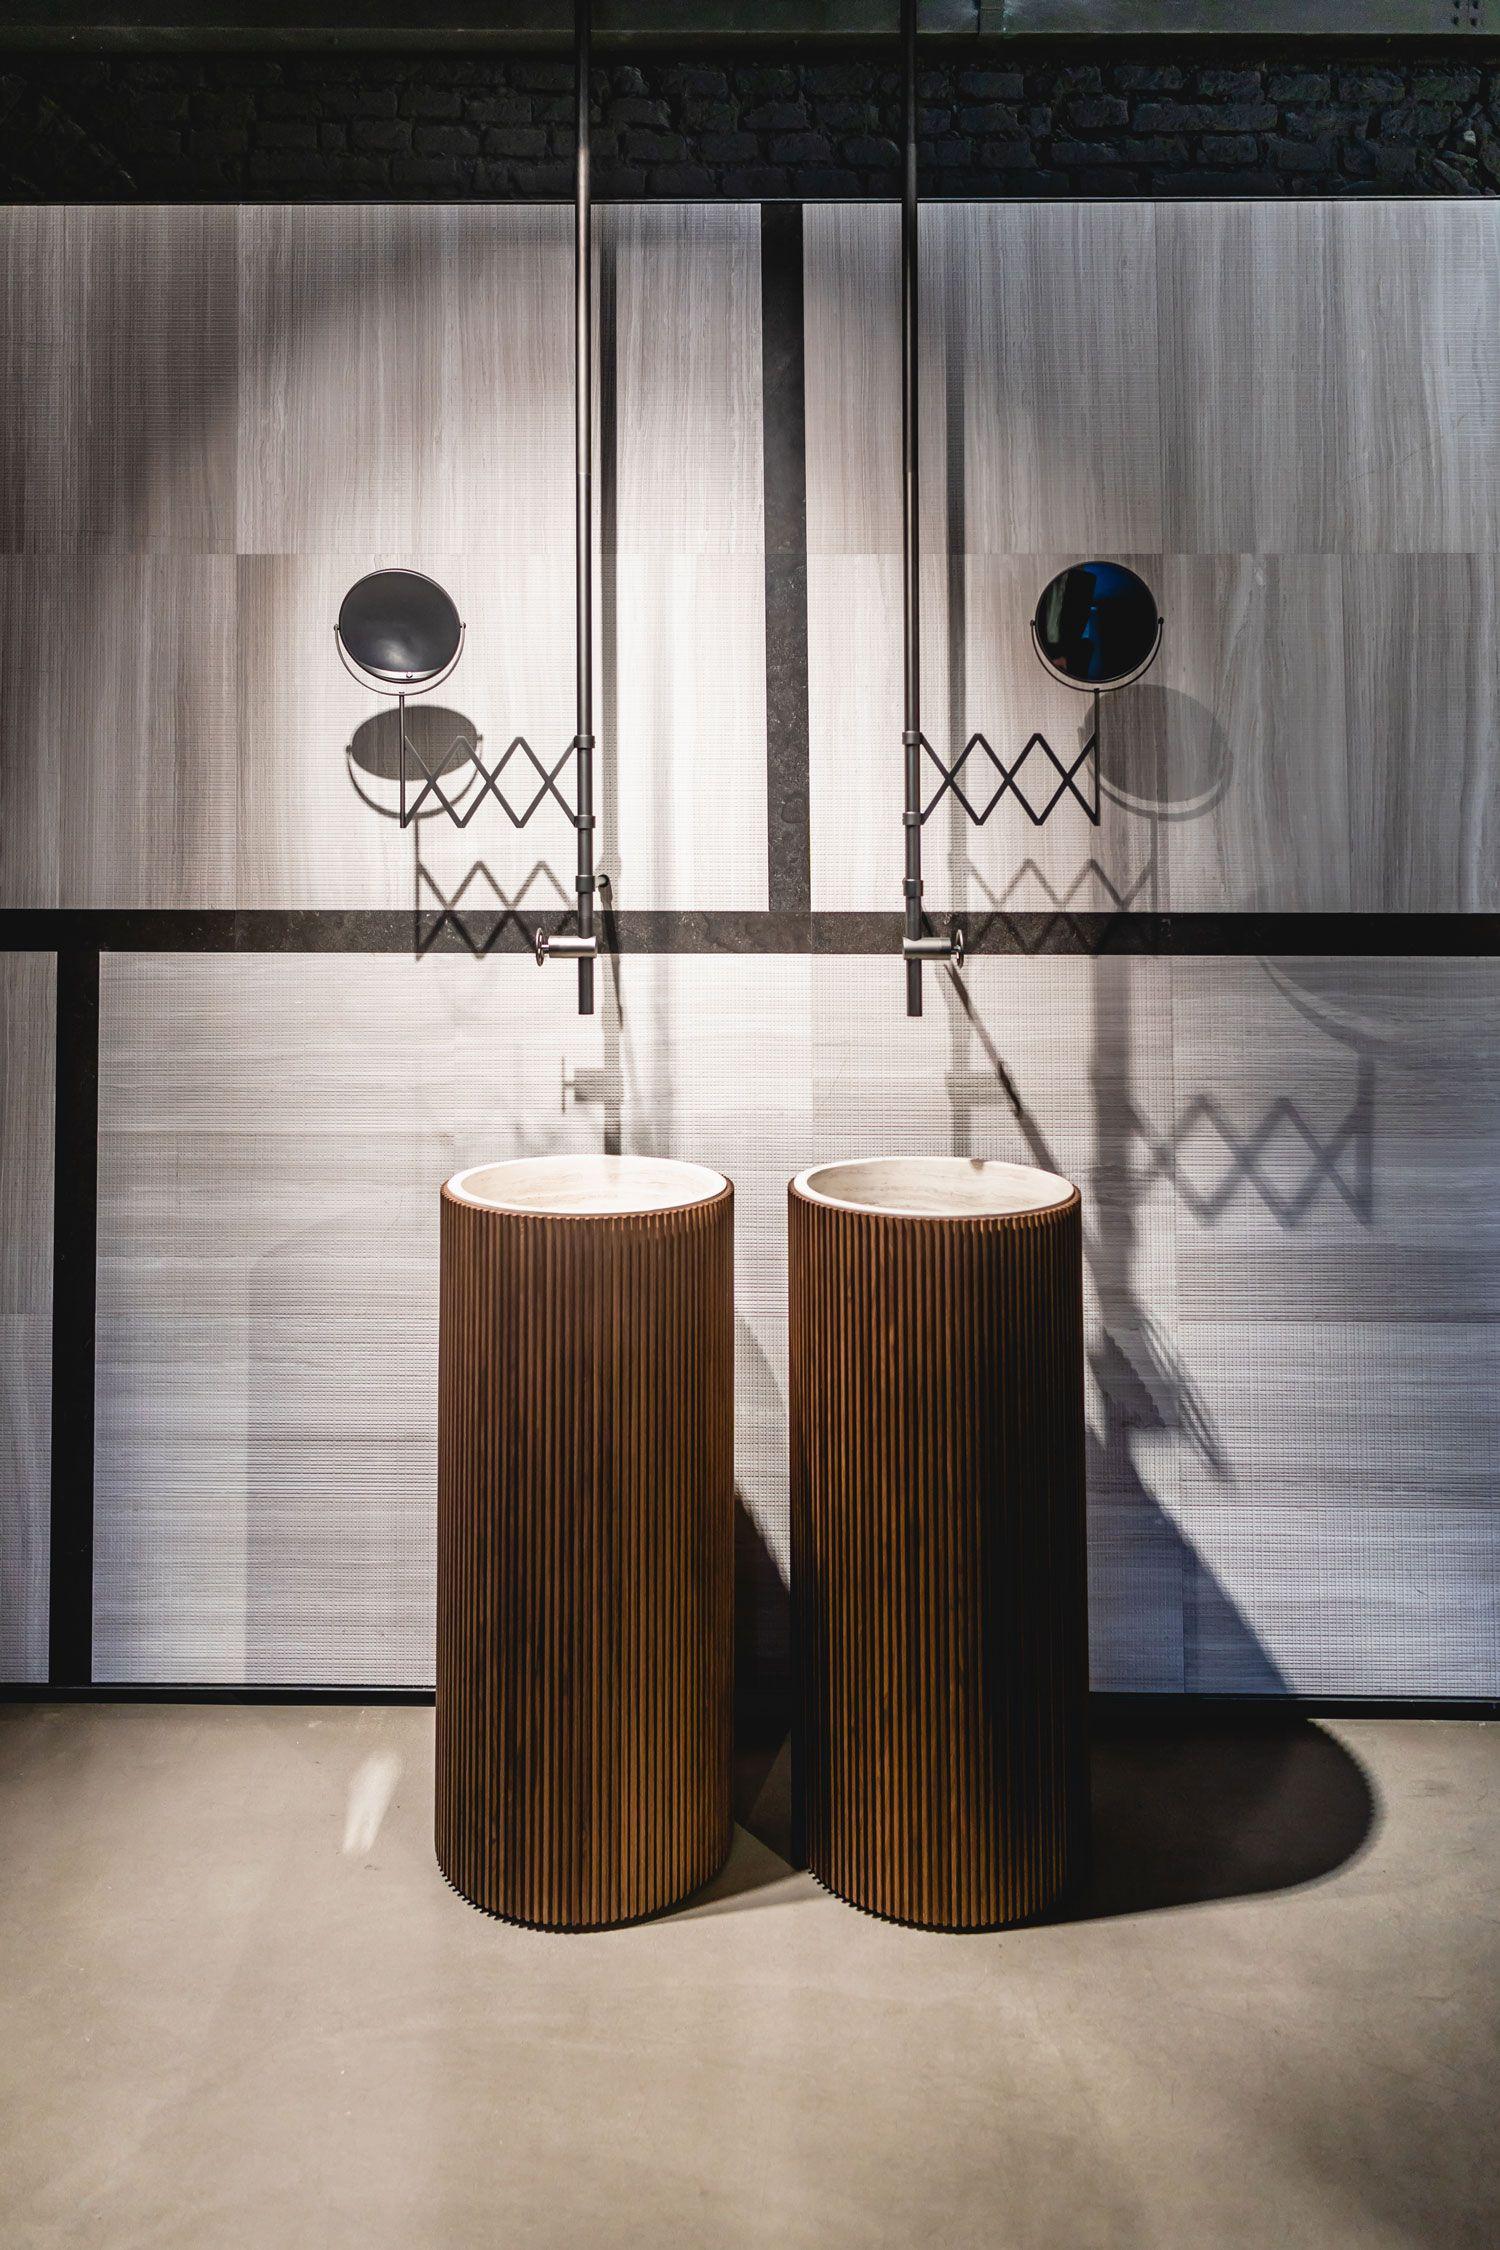 Interior Design Trends For 2020 From Milan Design Week 2019